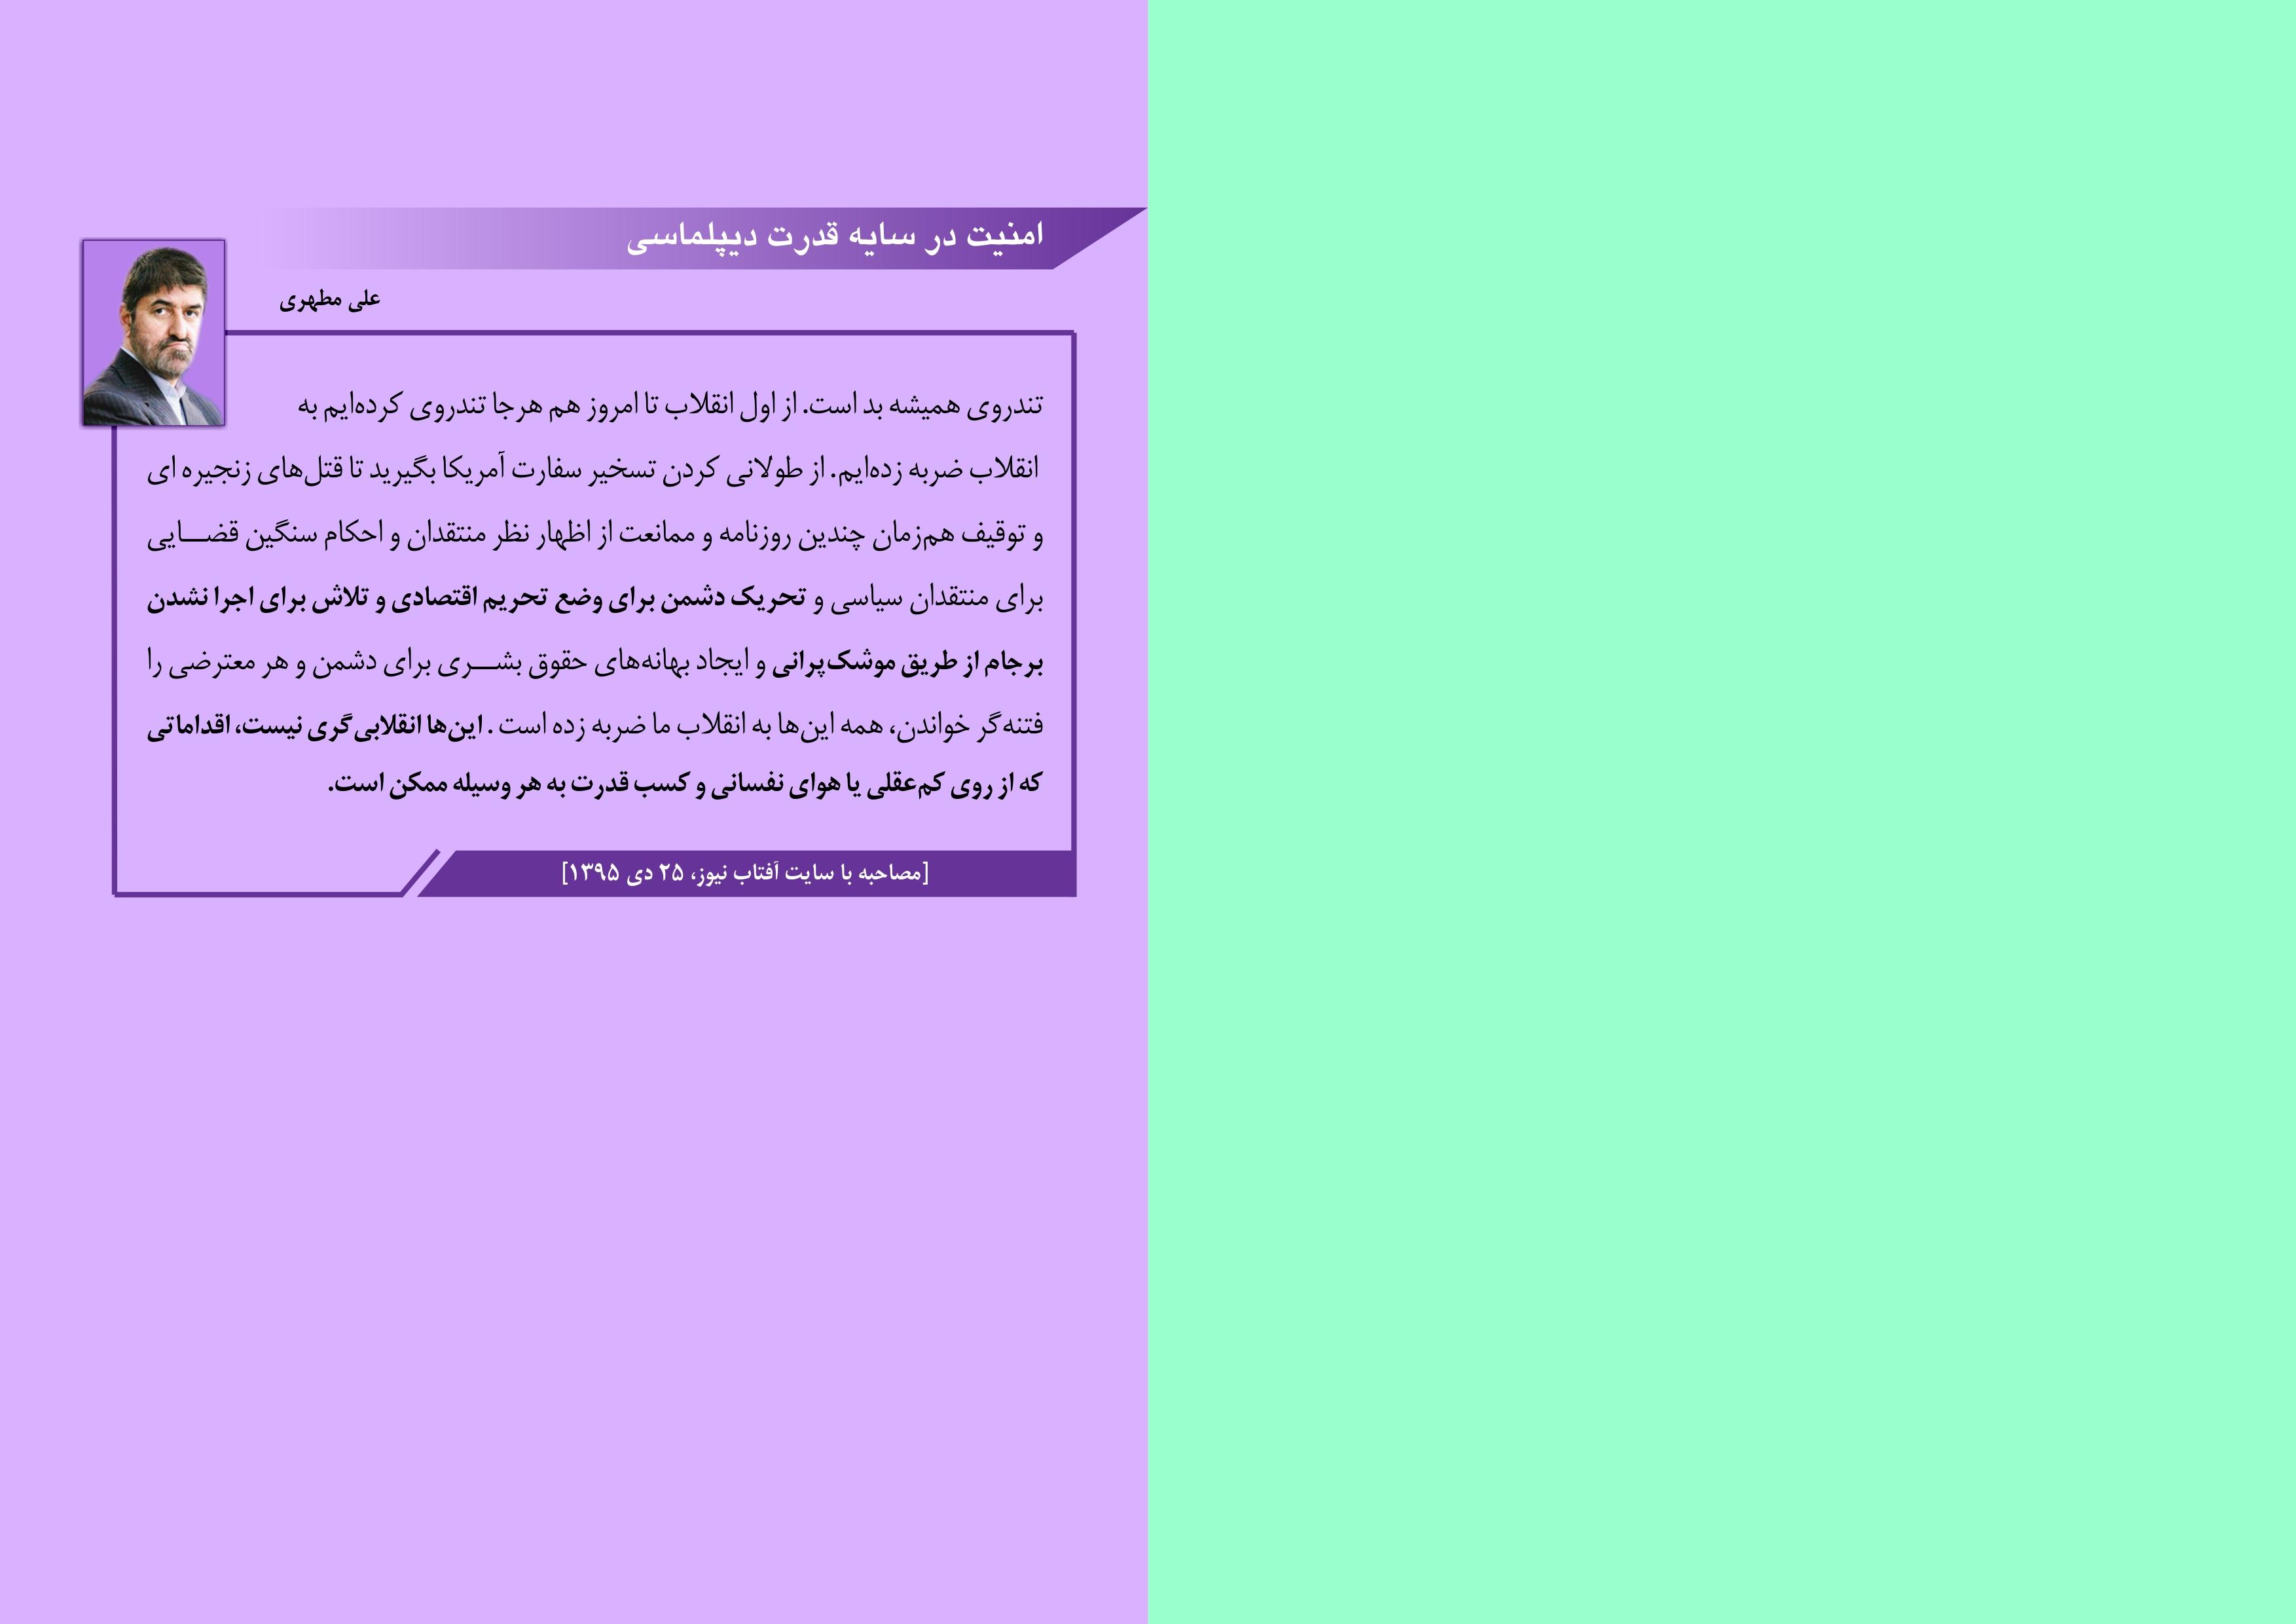 http://dl-abbasi.ir/yekta/1396/Image/Graphics/Taghabol/005-Defence-4.jpg